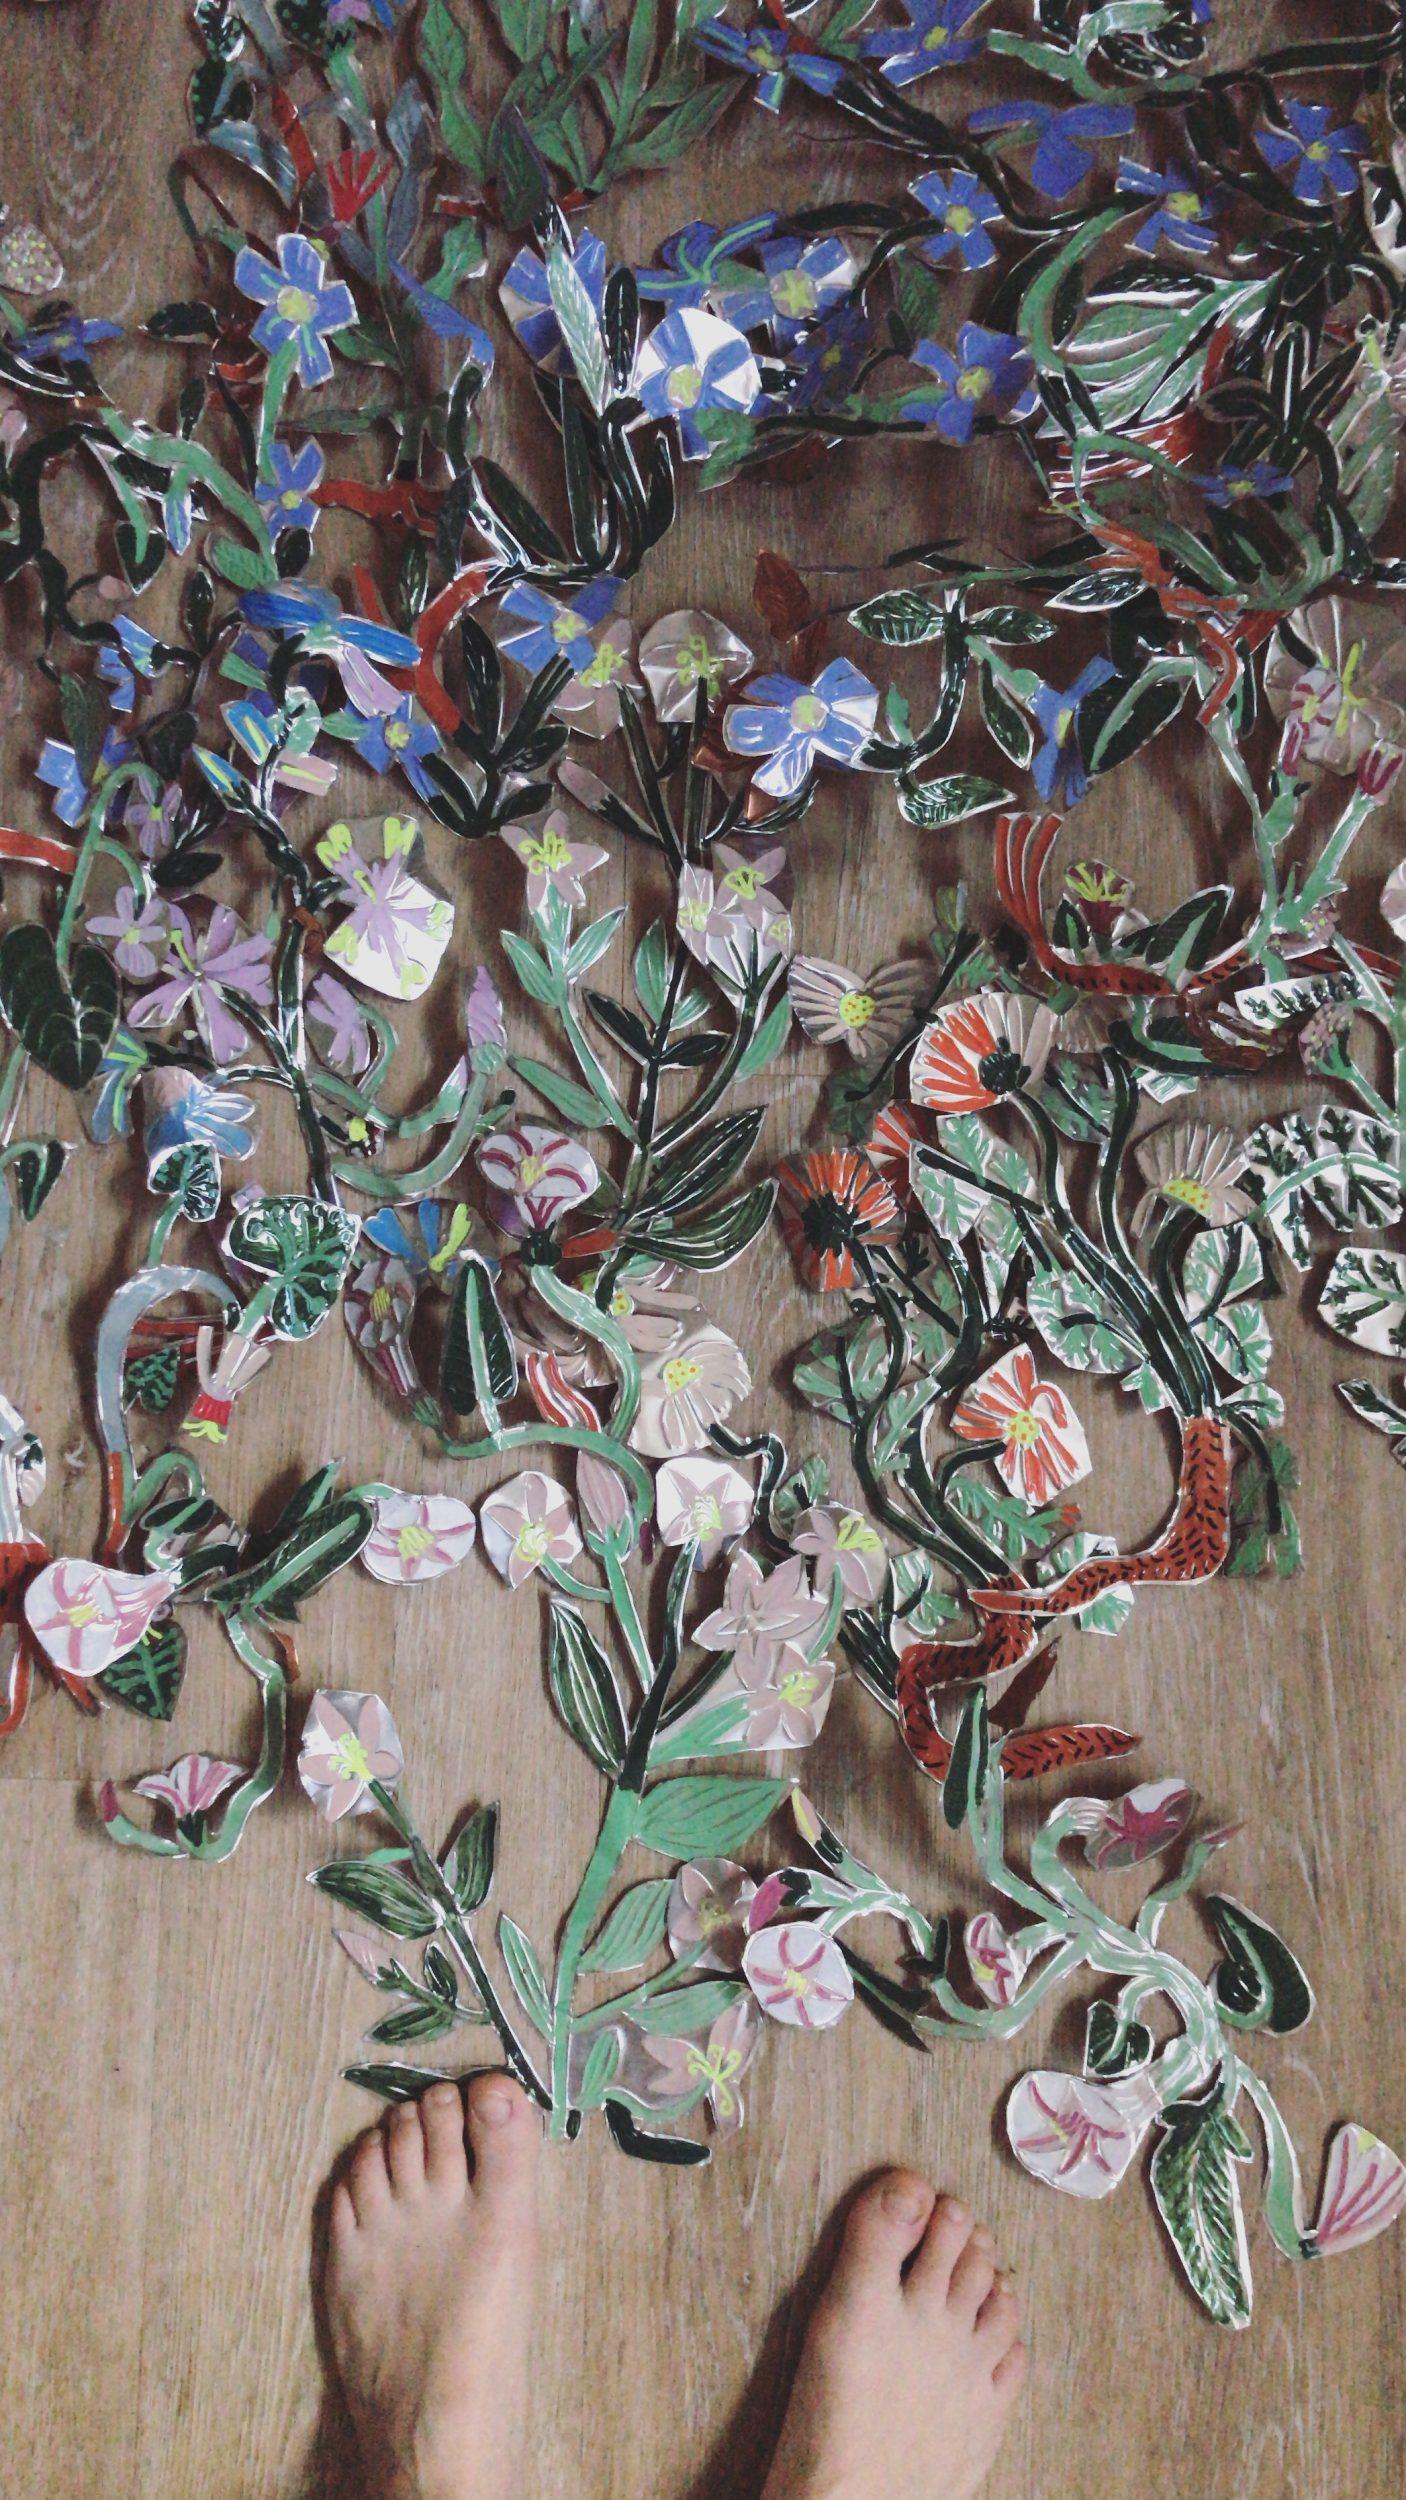 flowers ex-voto metal garden